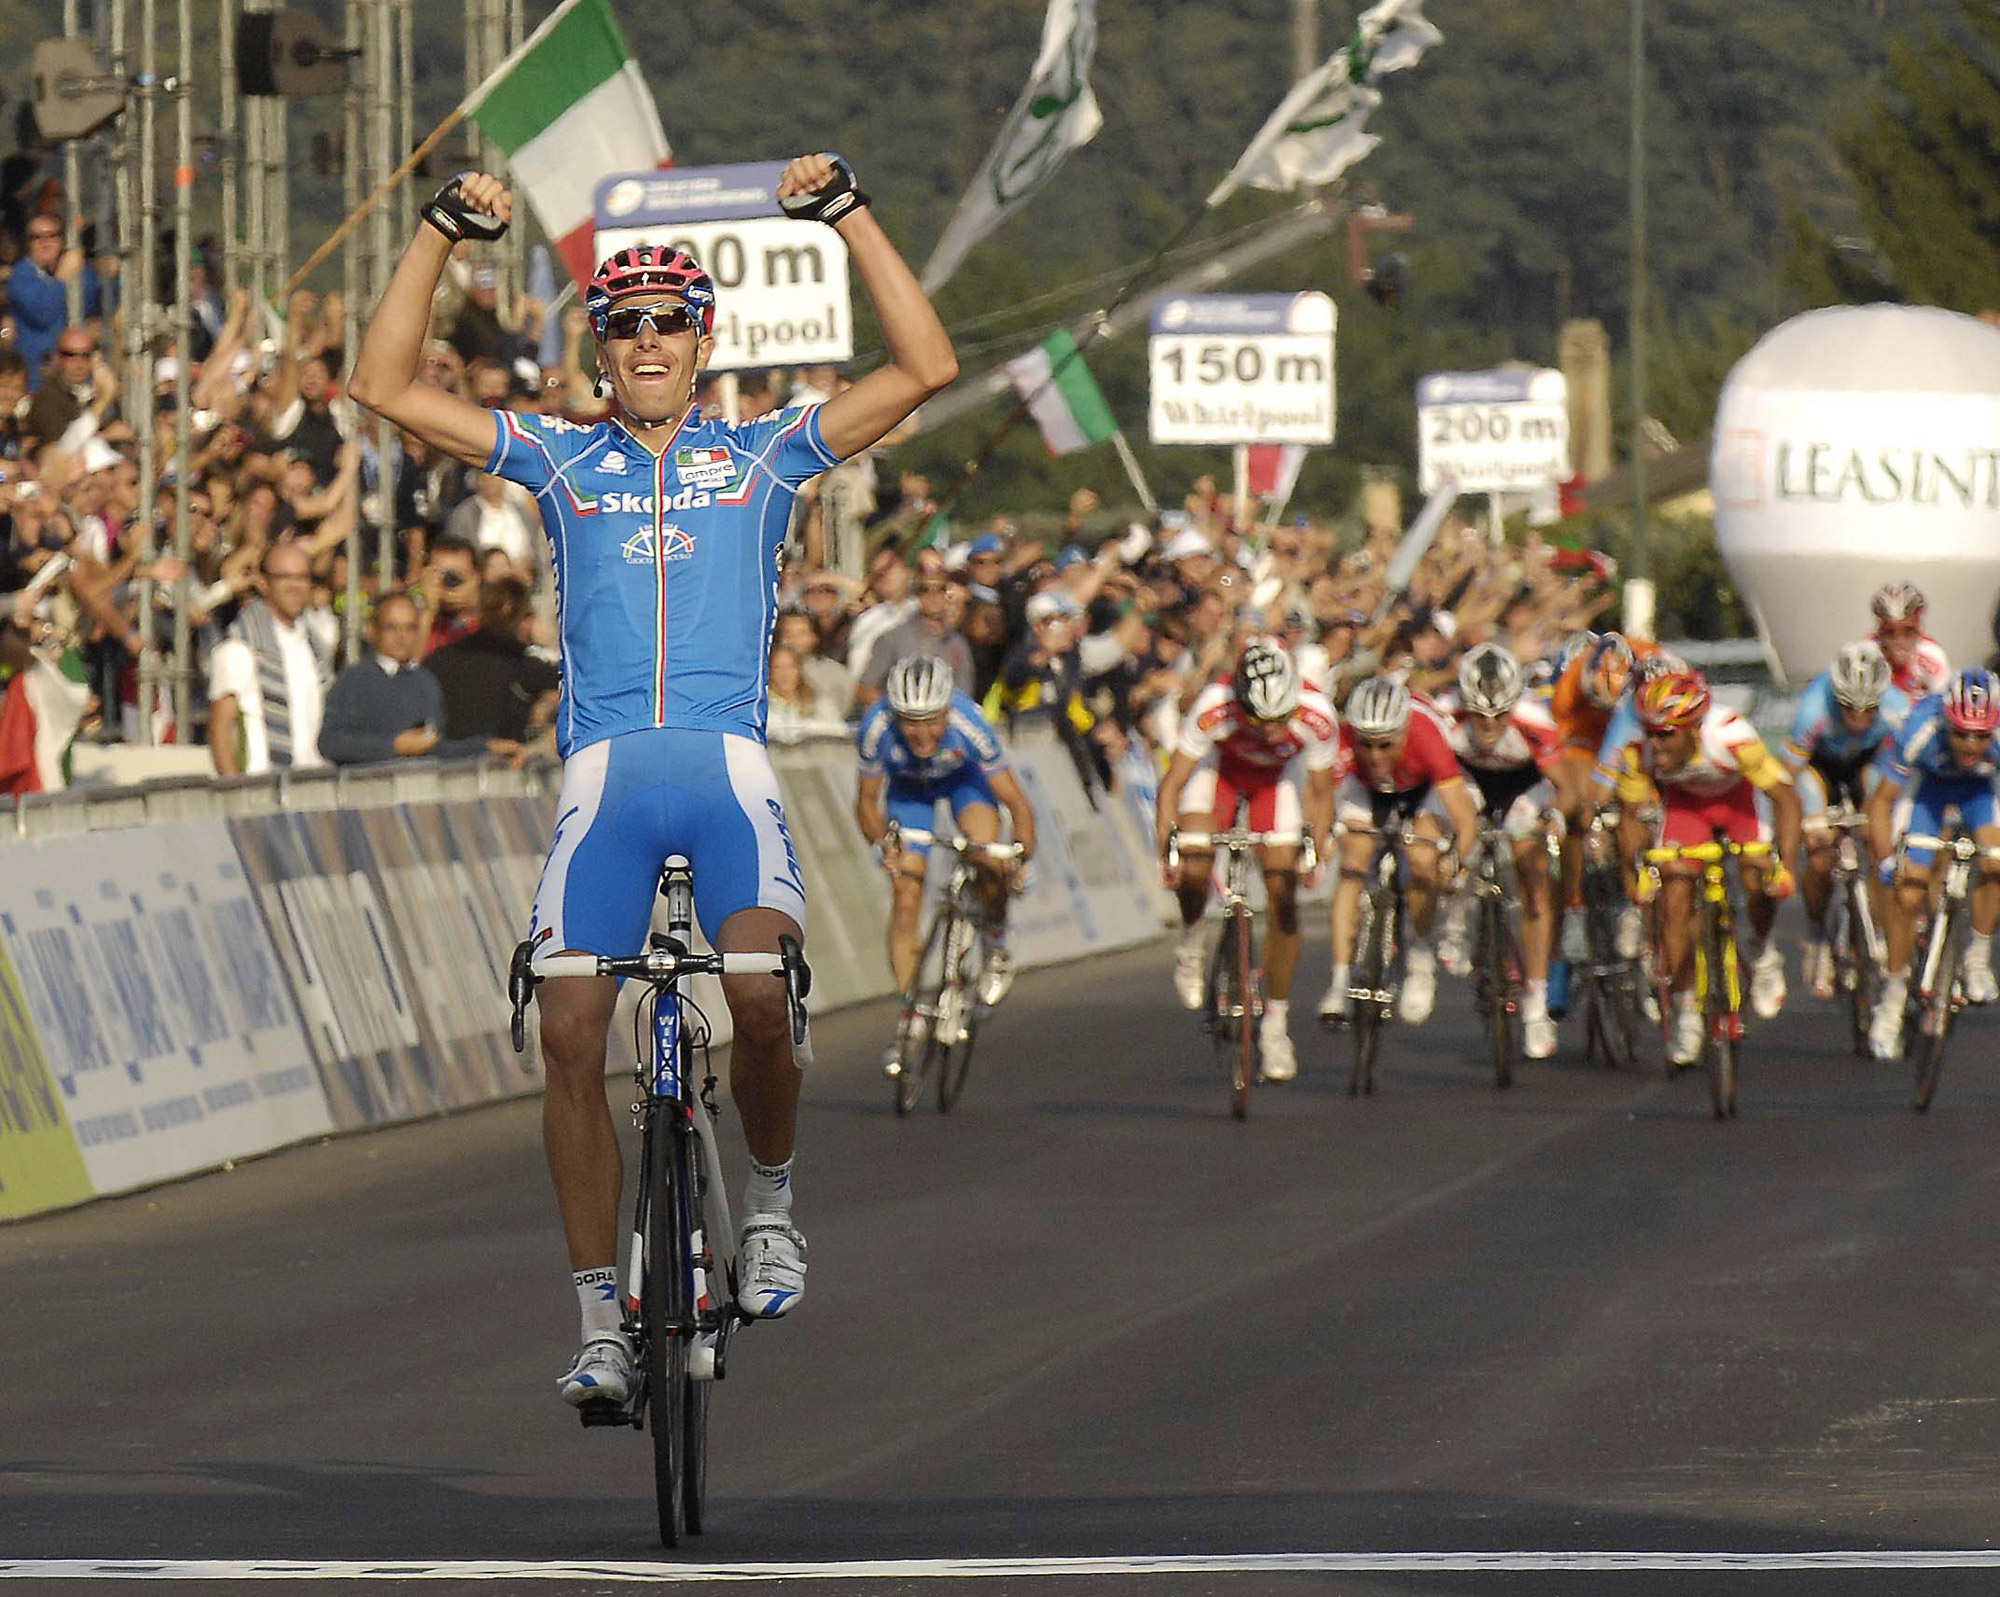 World Cycling Championship 2008 - Varese (Italy)